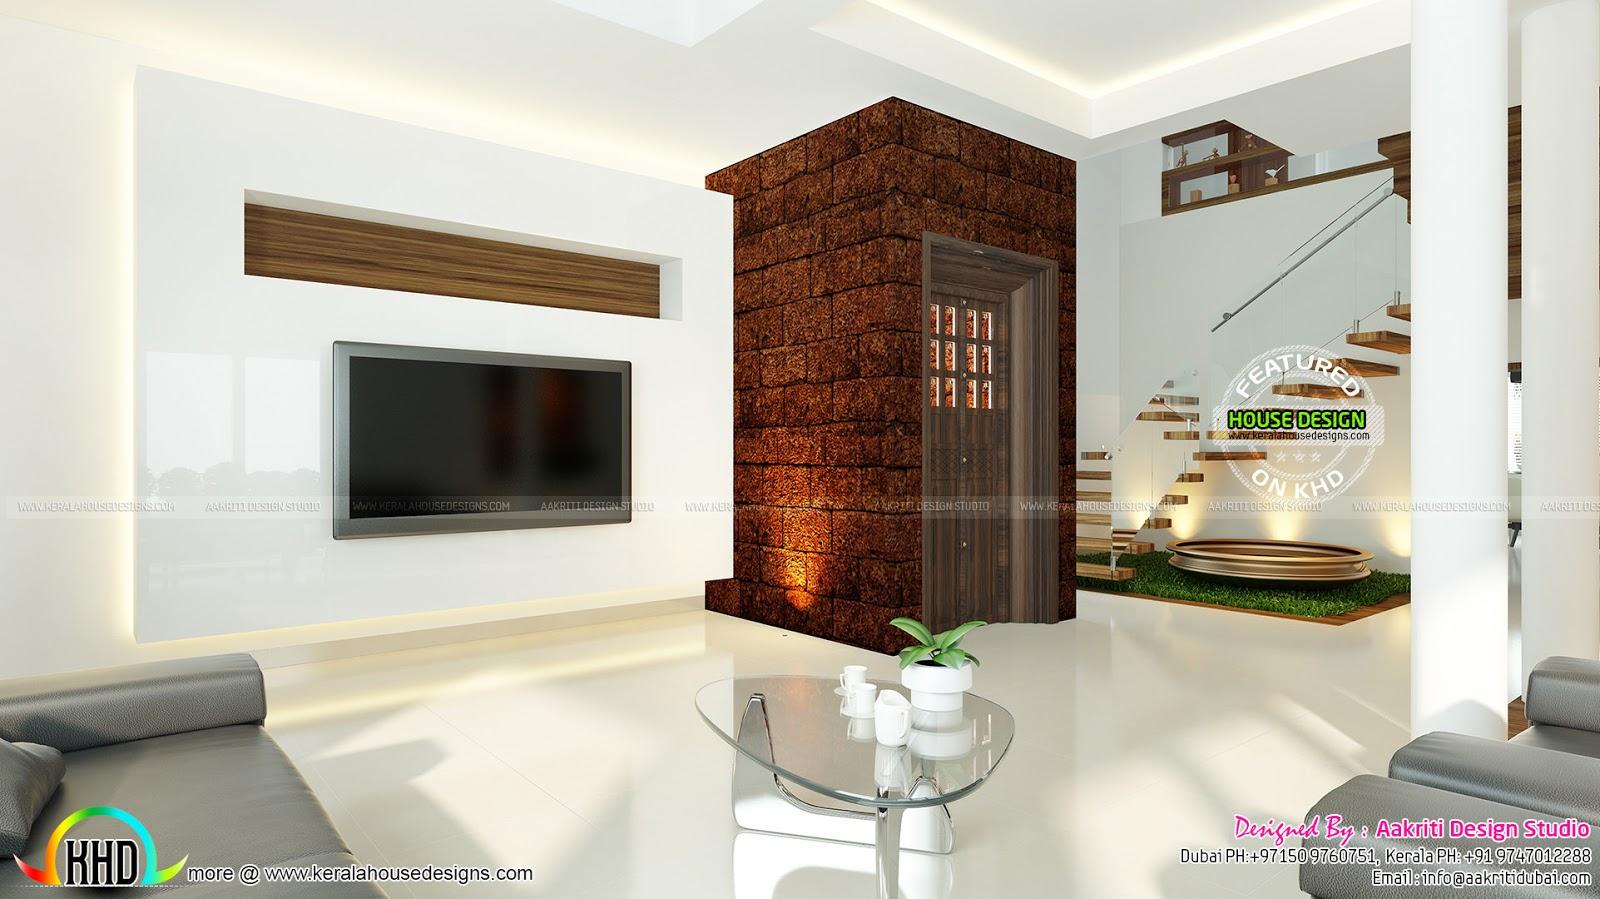 Modern interior designs kerala home design and floor plans - Modern interior wall design ideas ...